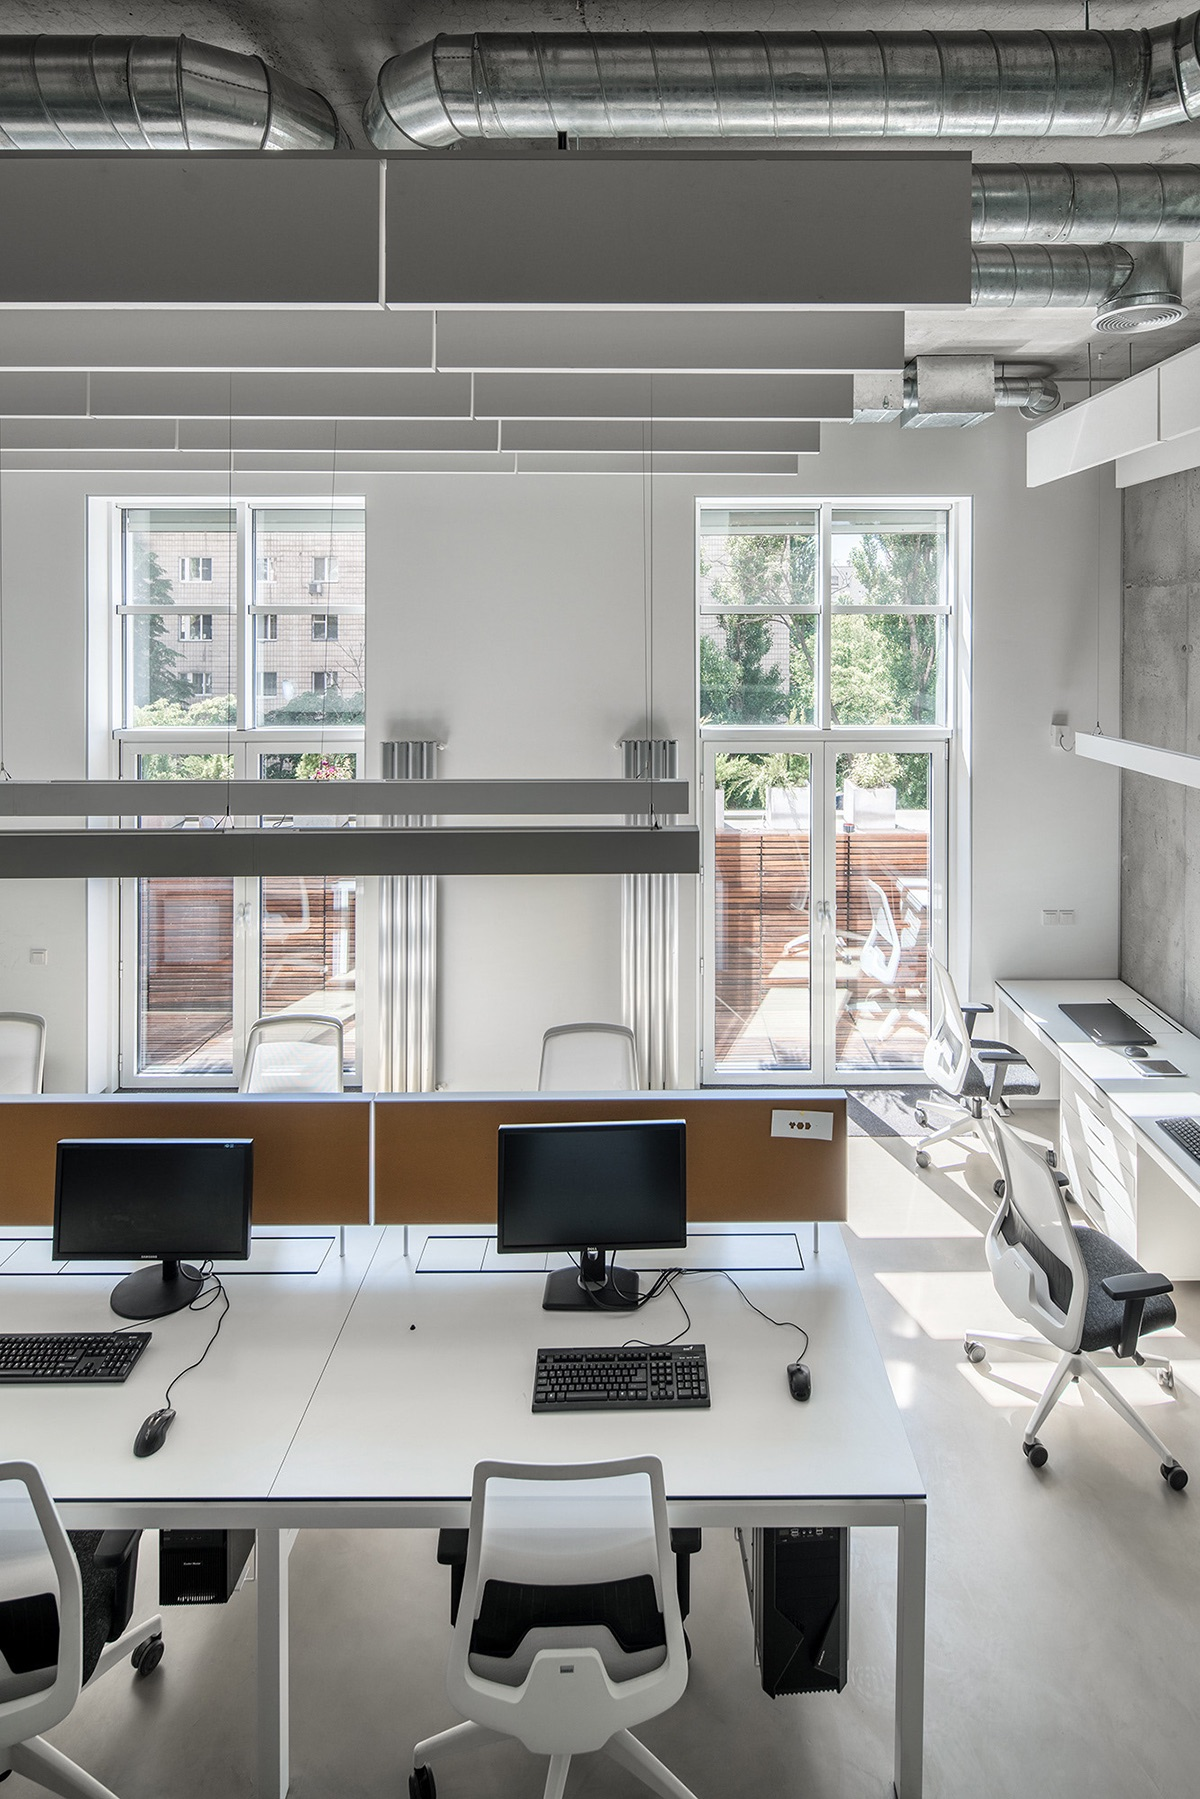 Laboratory Room Design: A Look Inside YOD Design Lab's Modern Kiev Office